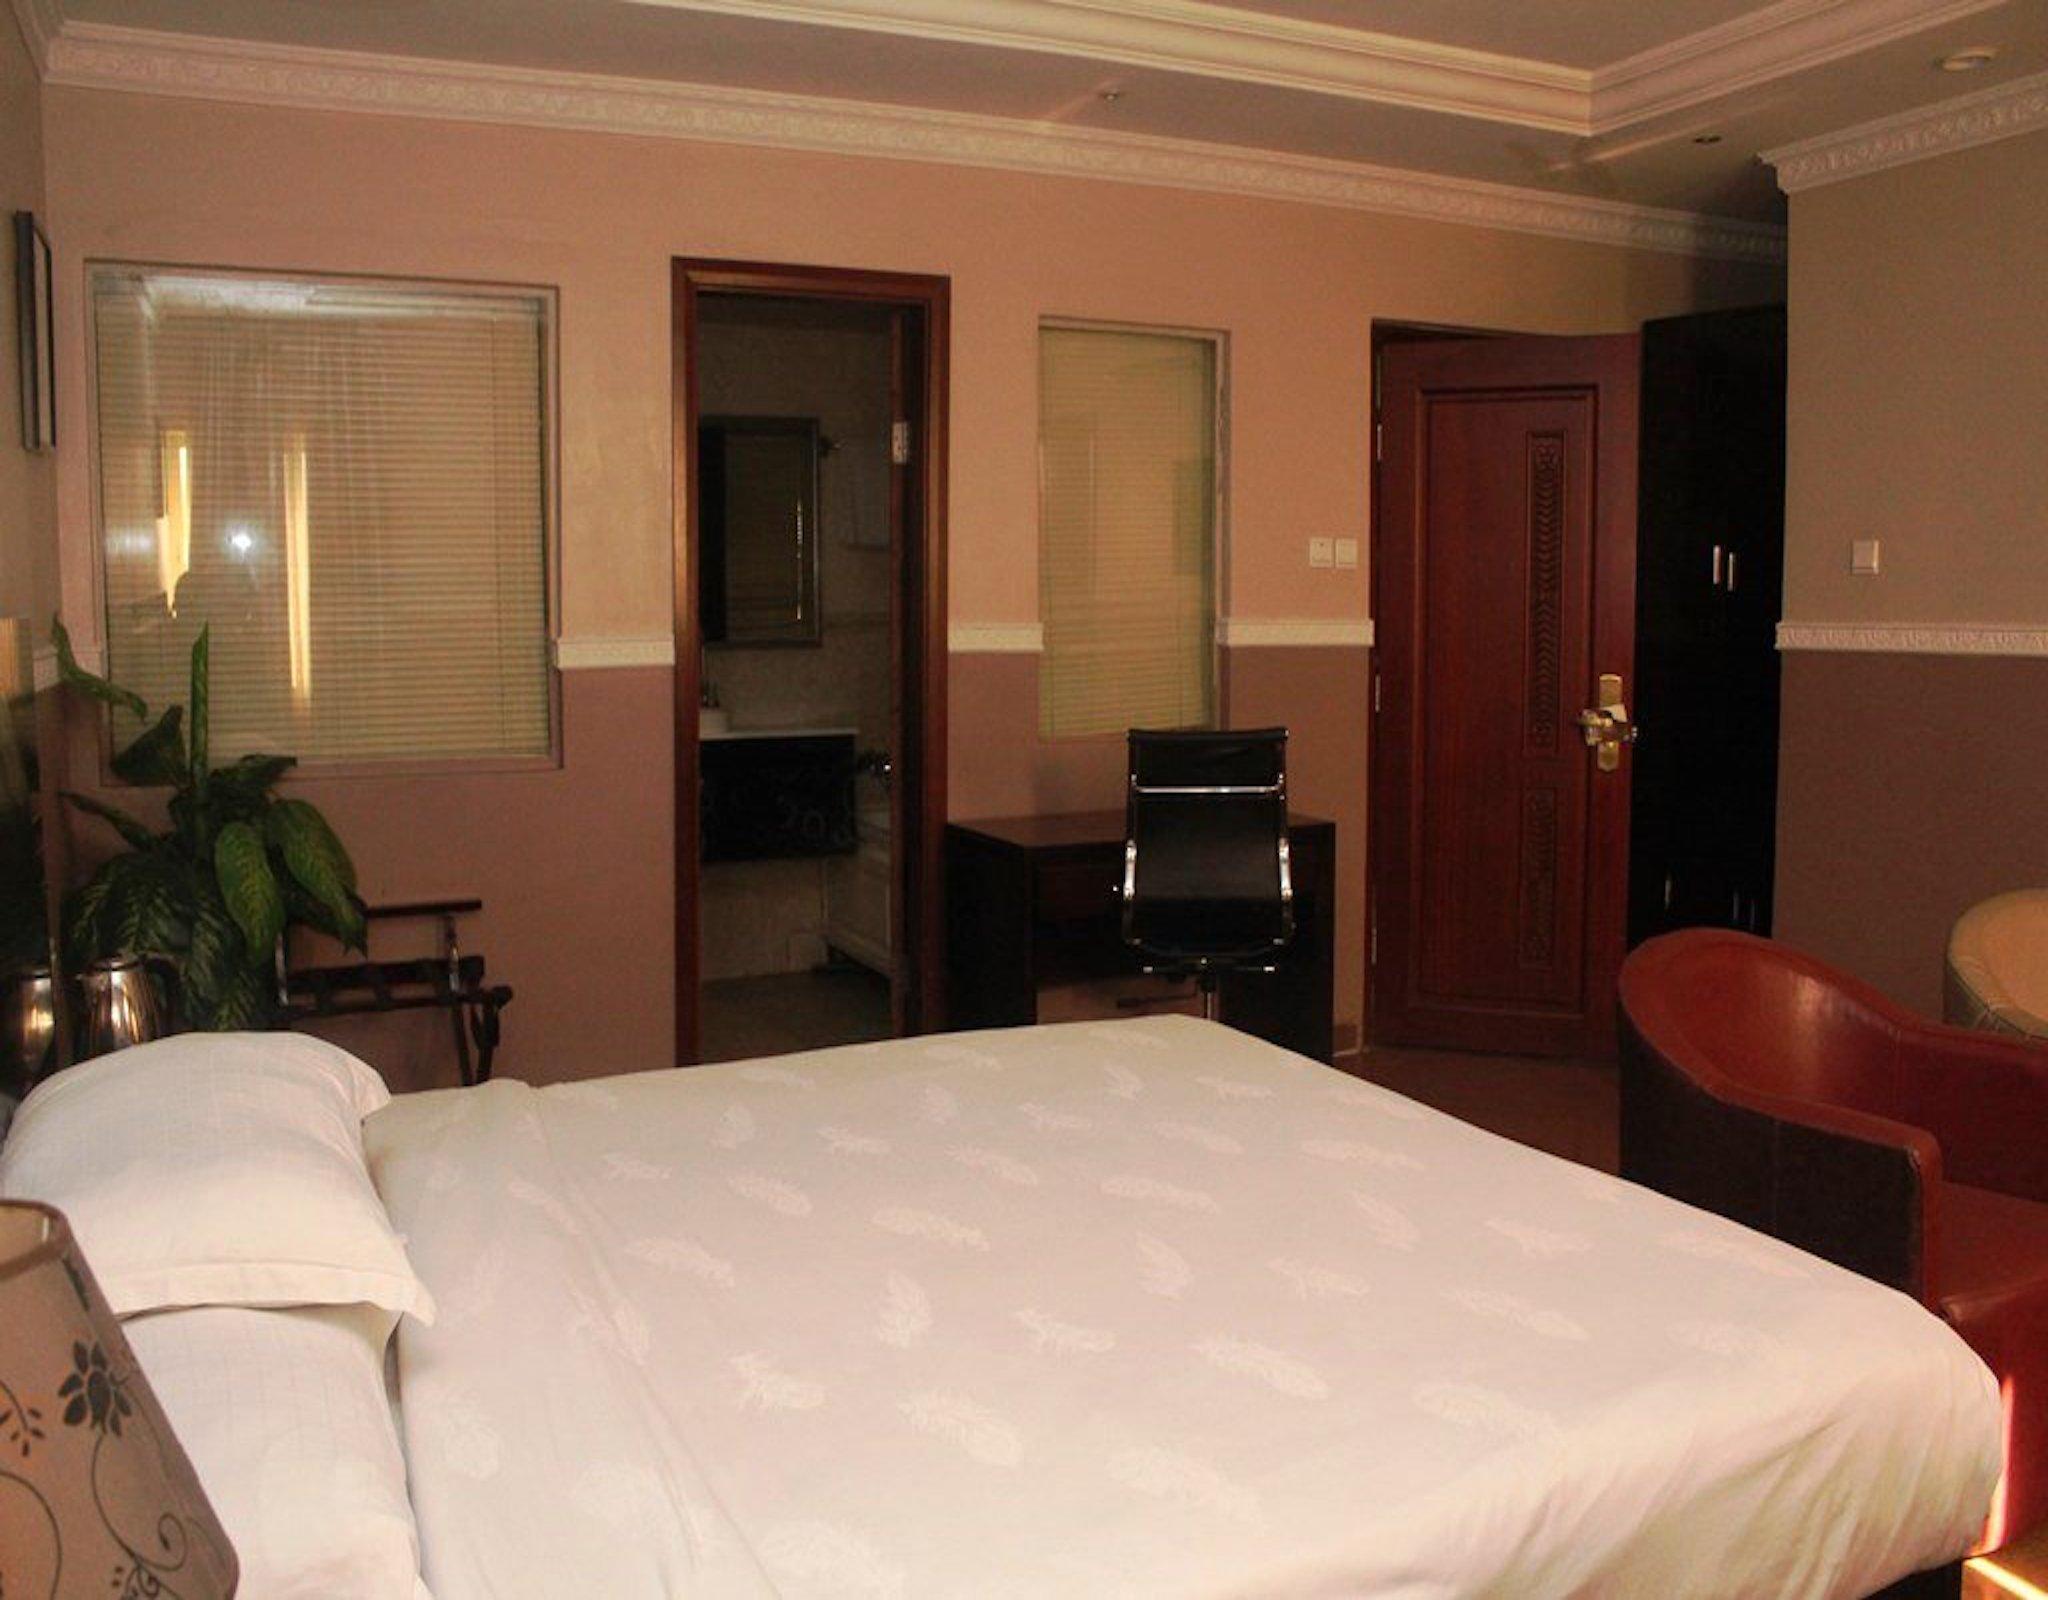 Carat 24 Business Hotel & Suites LTD, Amuwo Odofin